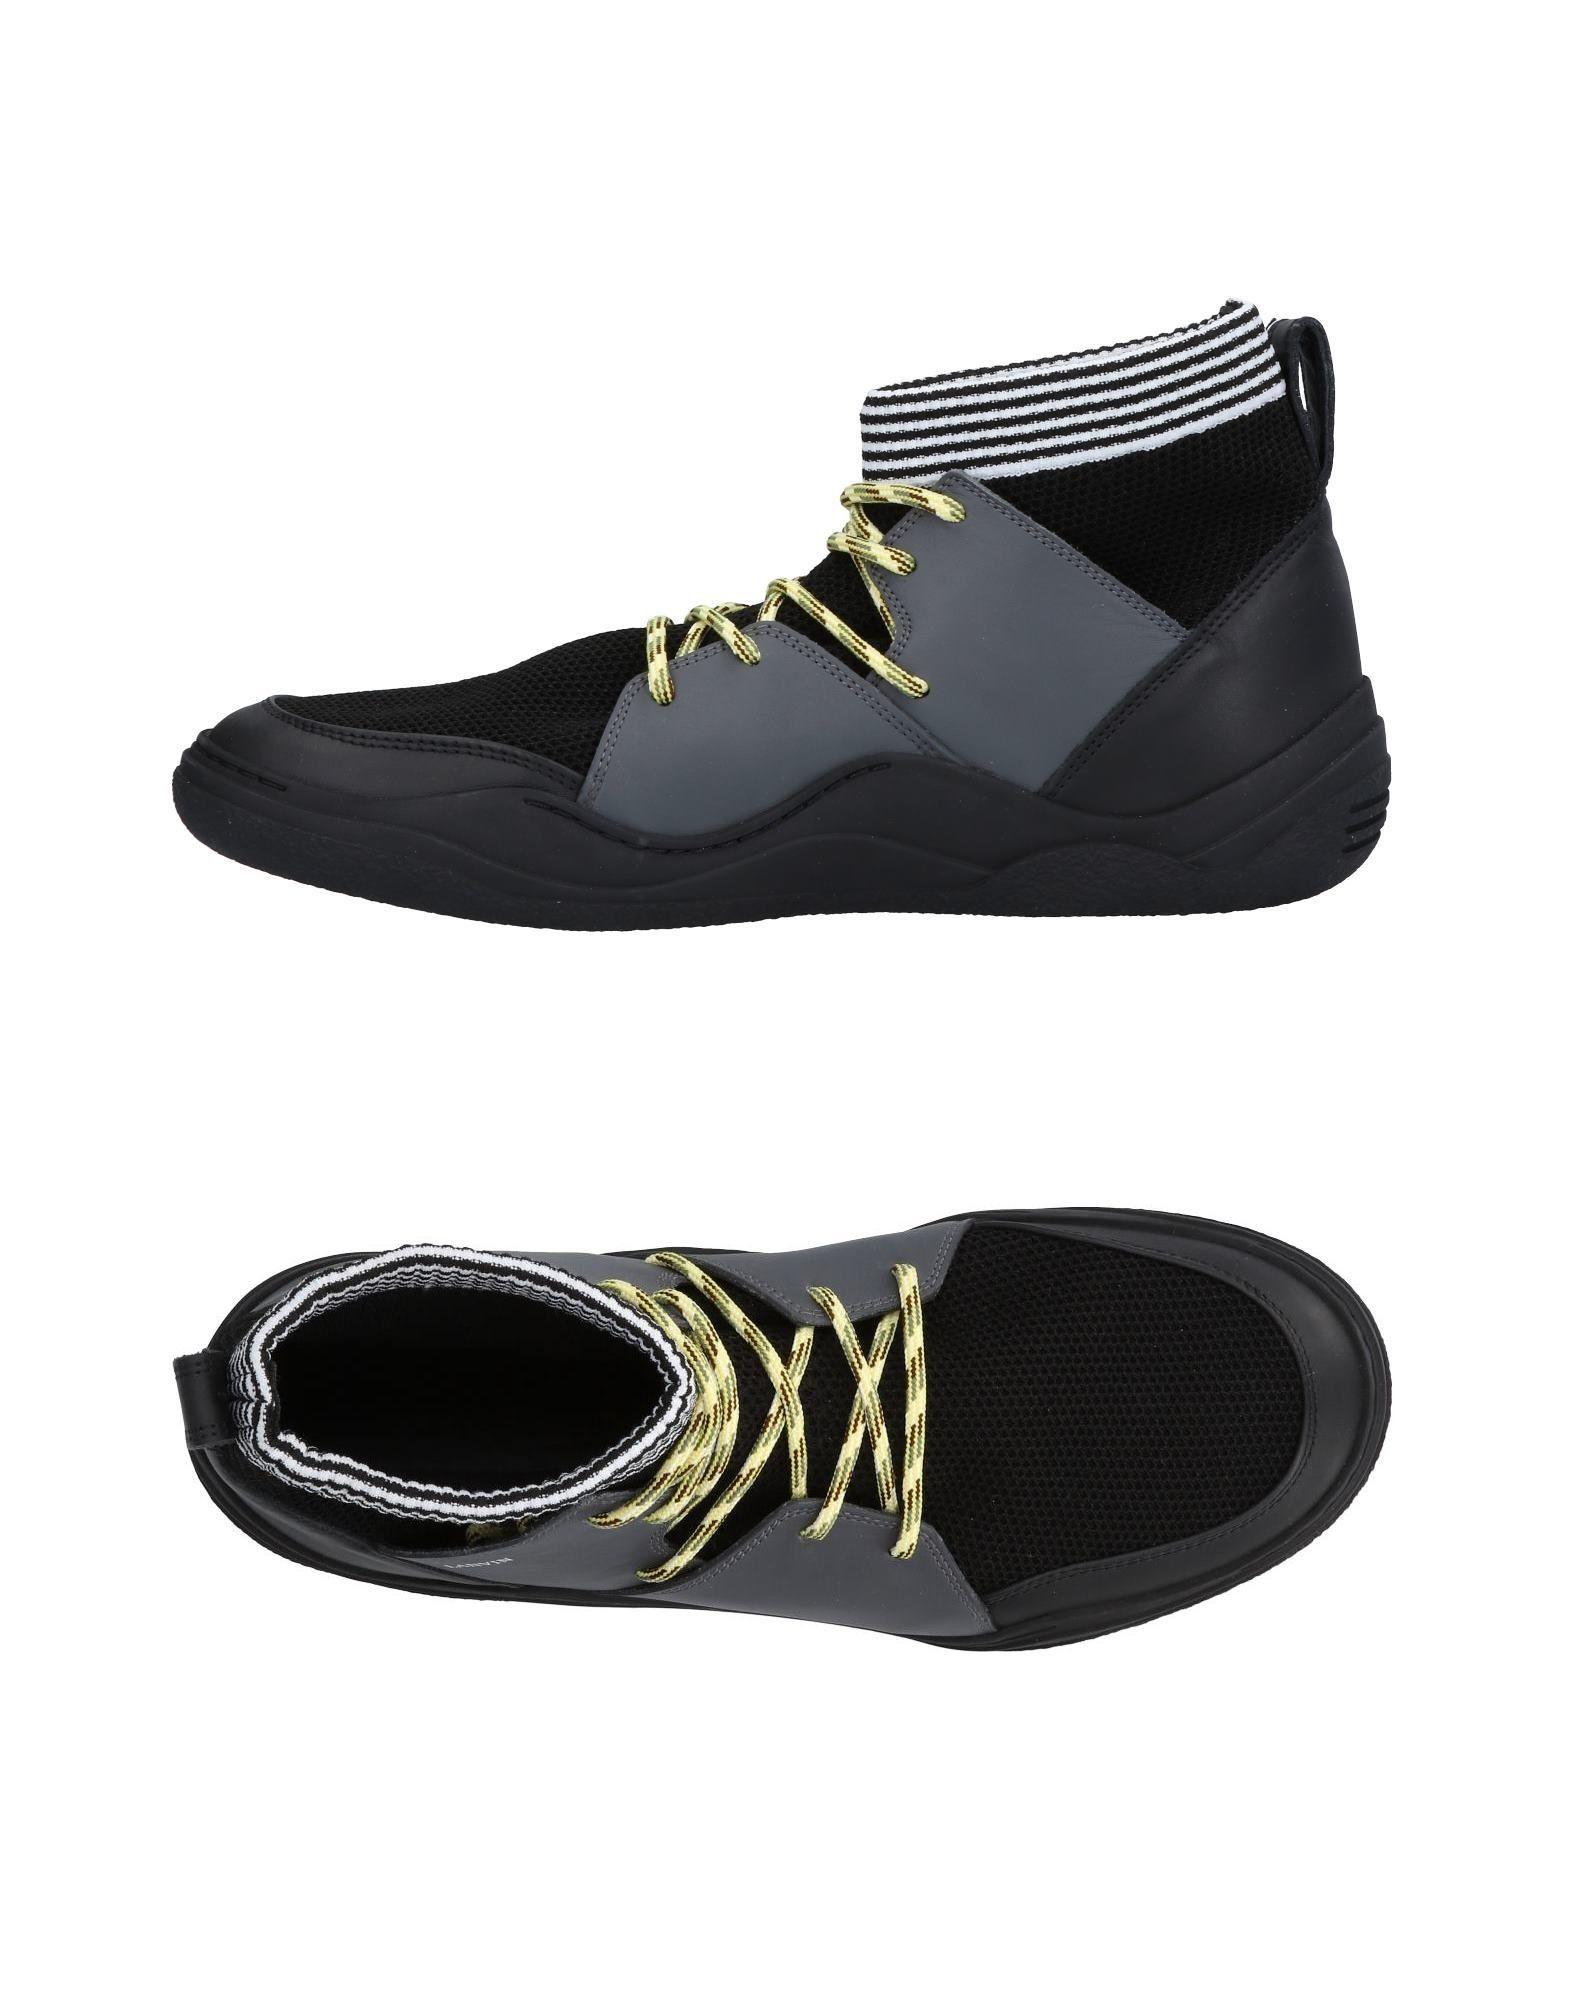 Moda Sneakers Lanvin Uomo - 11463716GA